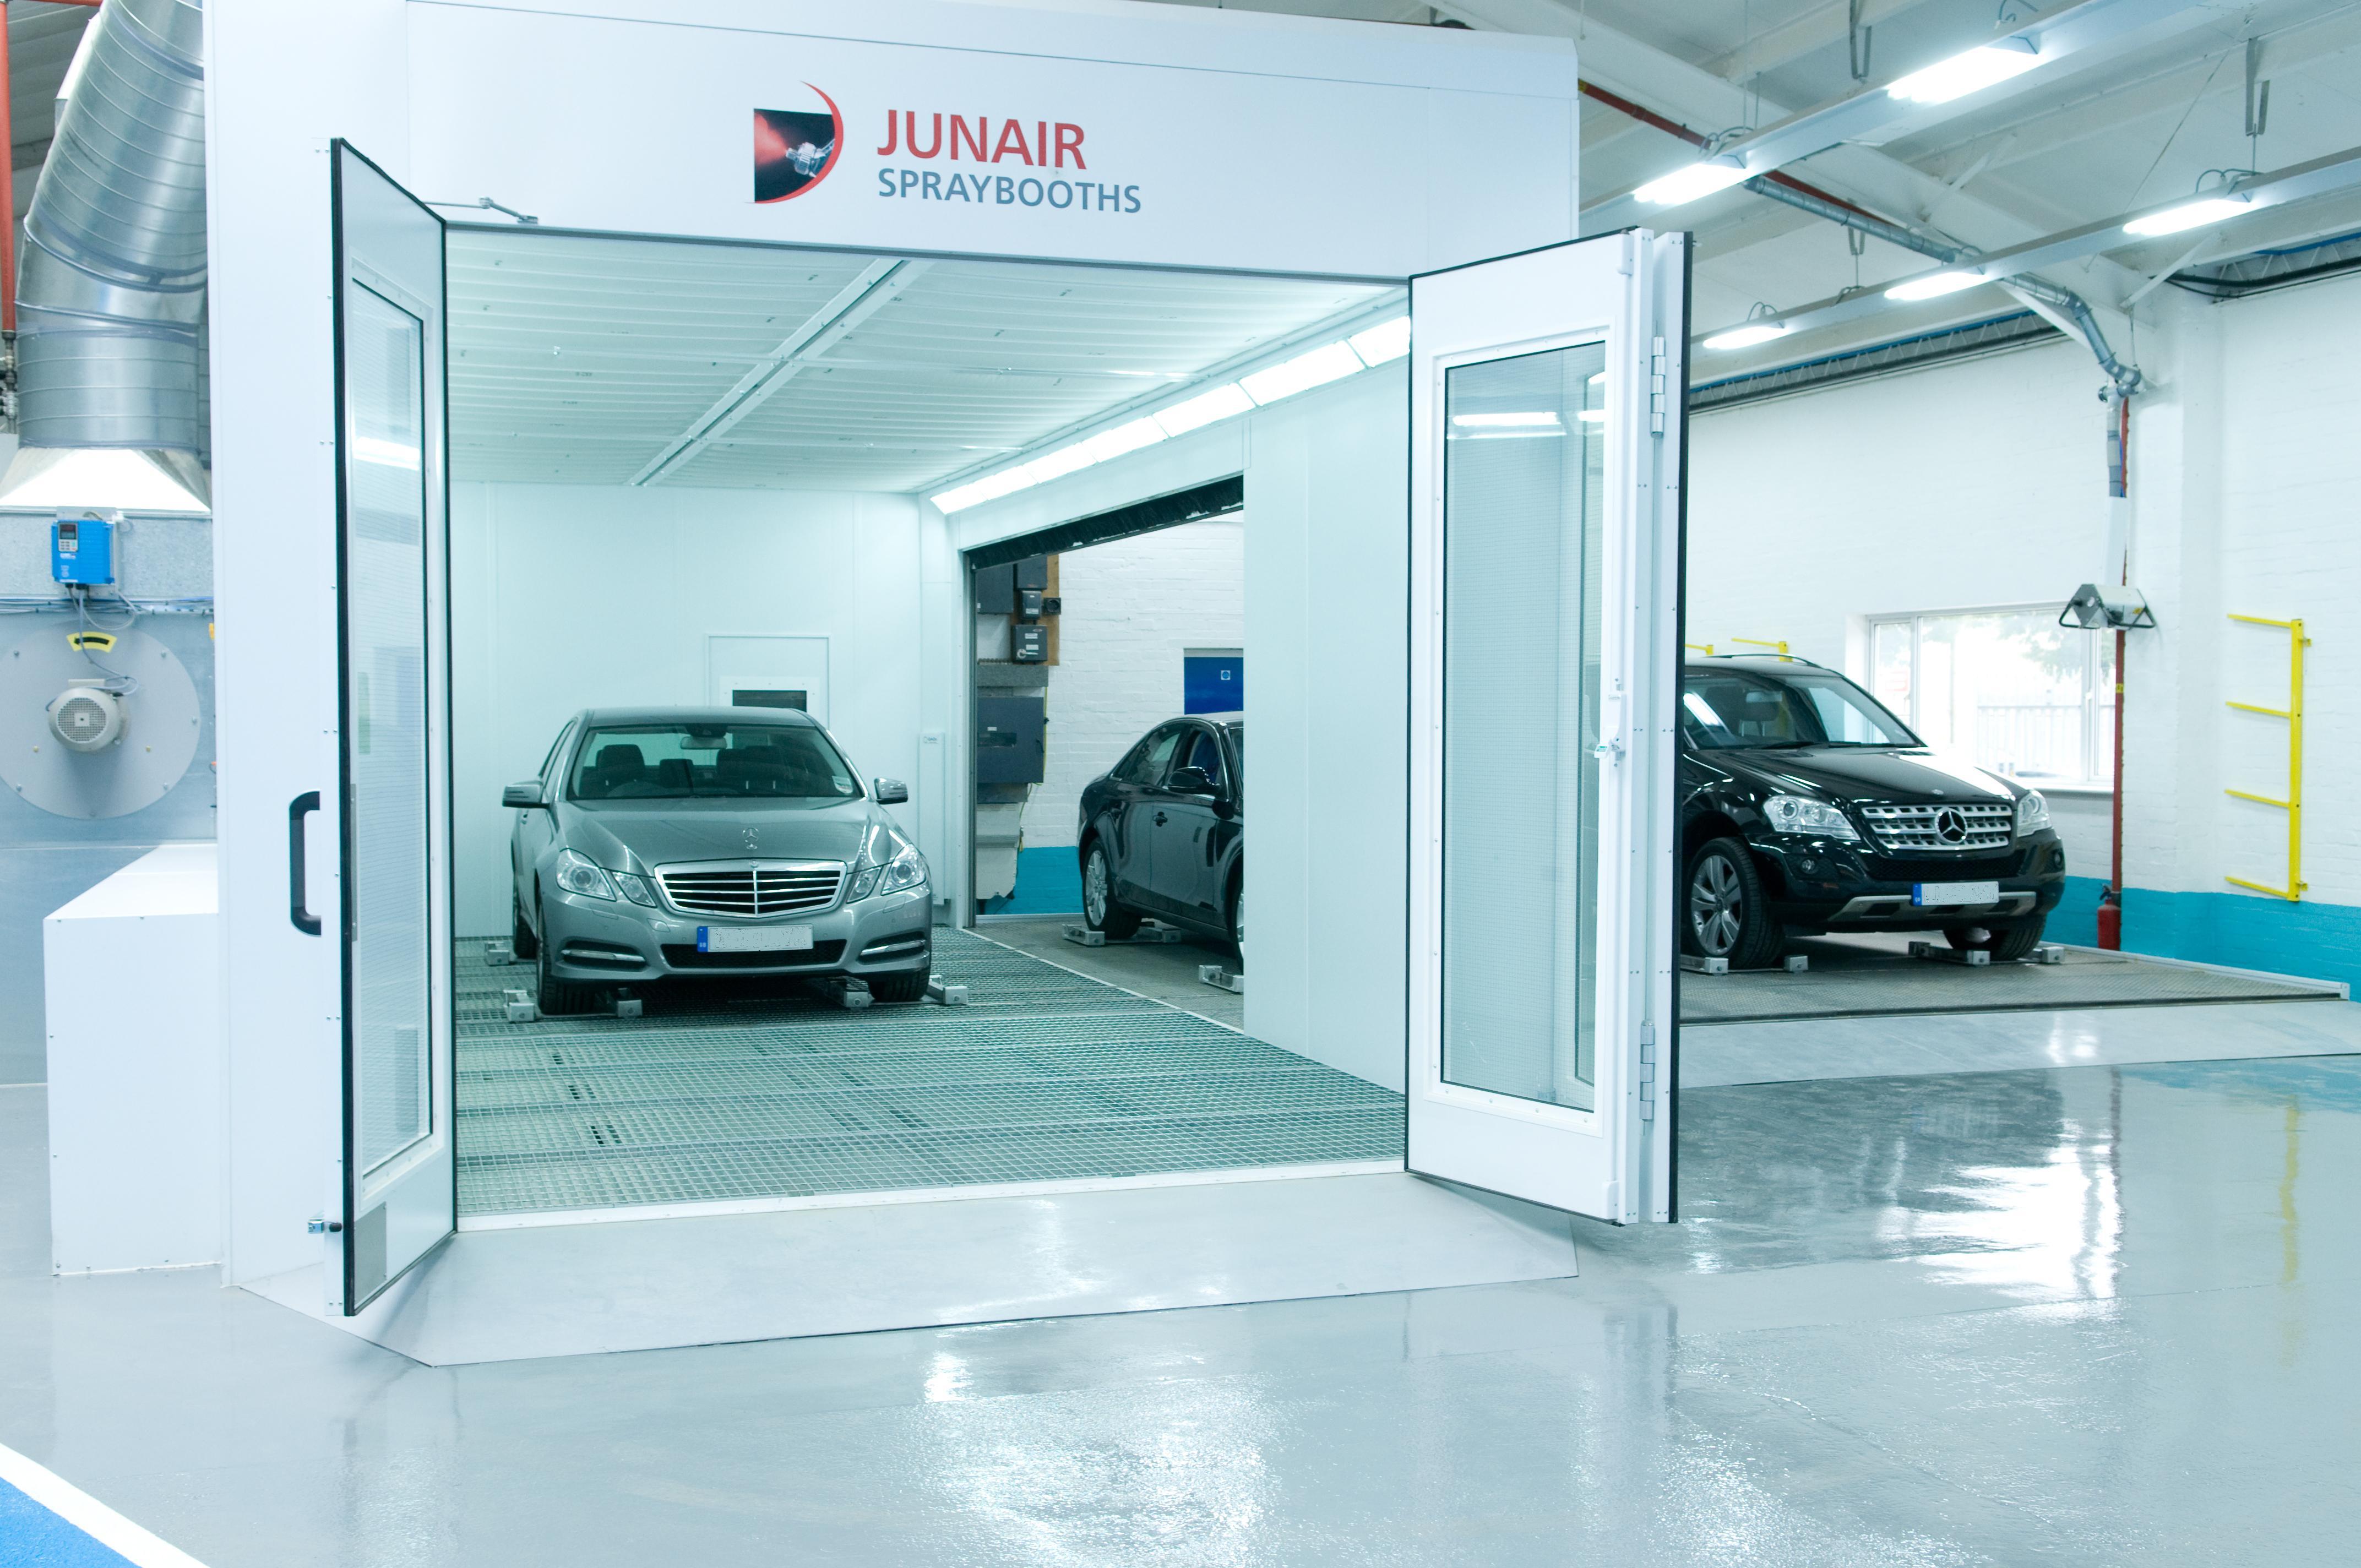 Junair Spraybooths Excavation Floor Extraction Spray Booth